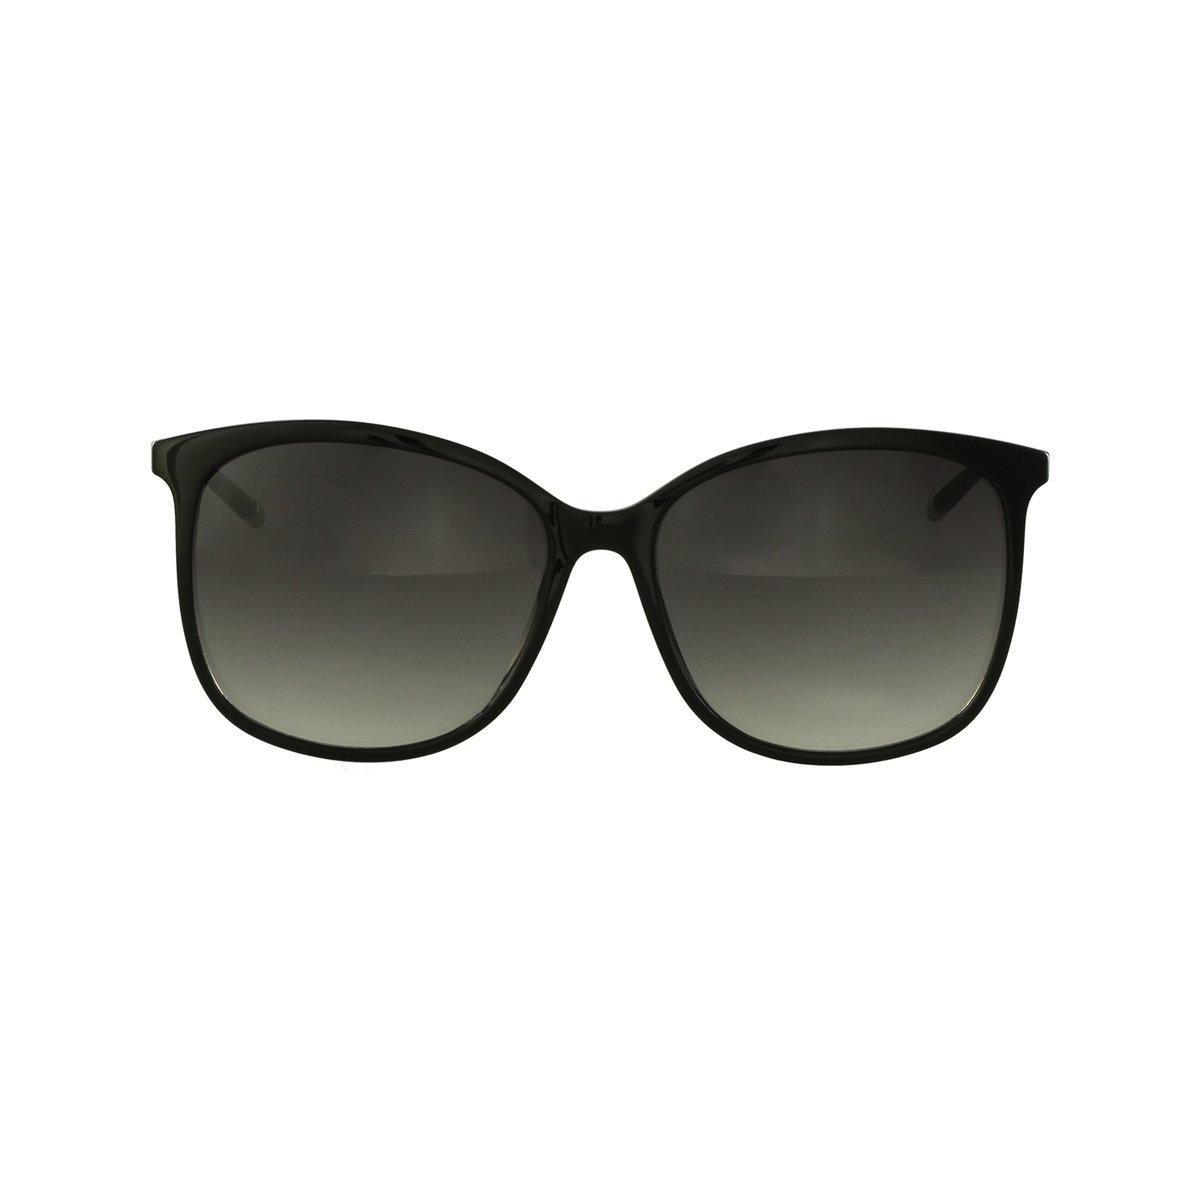 7b44dbdd0 Óculos De Sol Hickmann - Compre Agora | Zattini